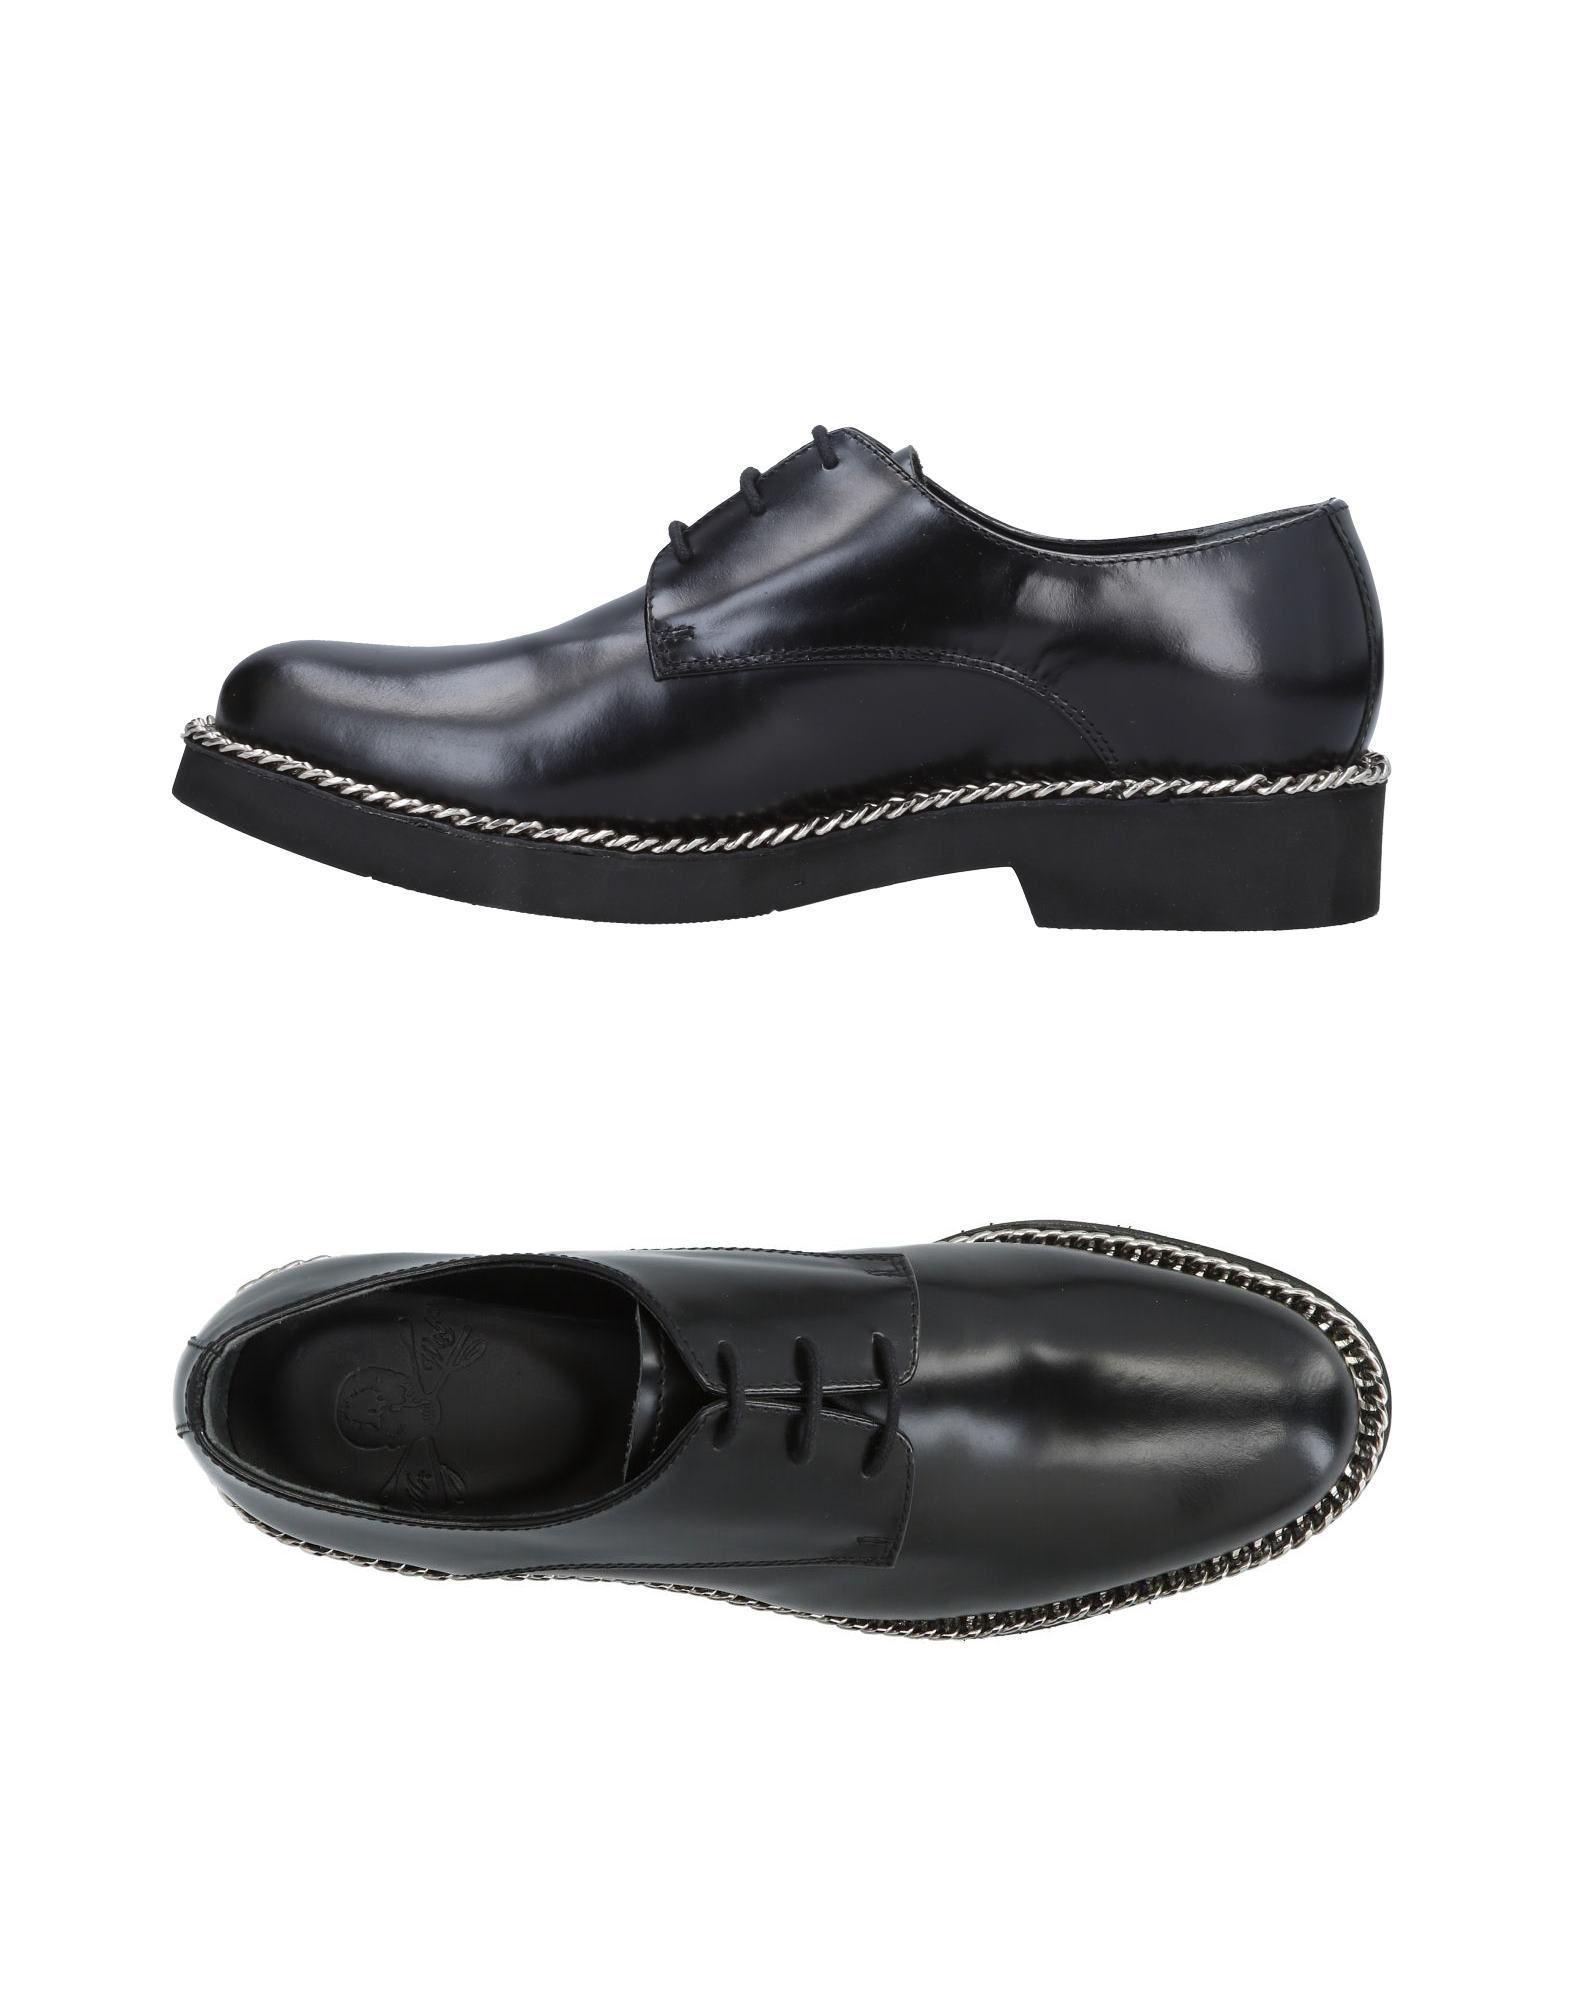 Mr. M. Wolf Lace-up Shoe Loup Chaussures À Lacets X18iq